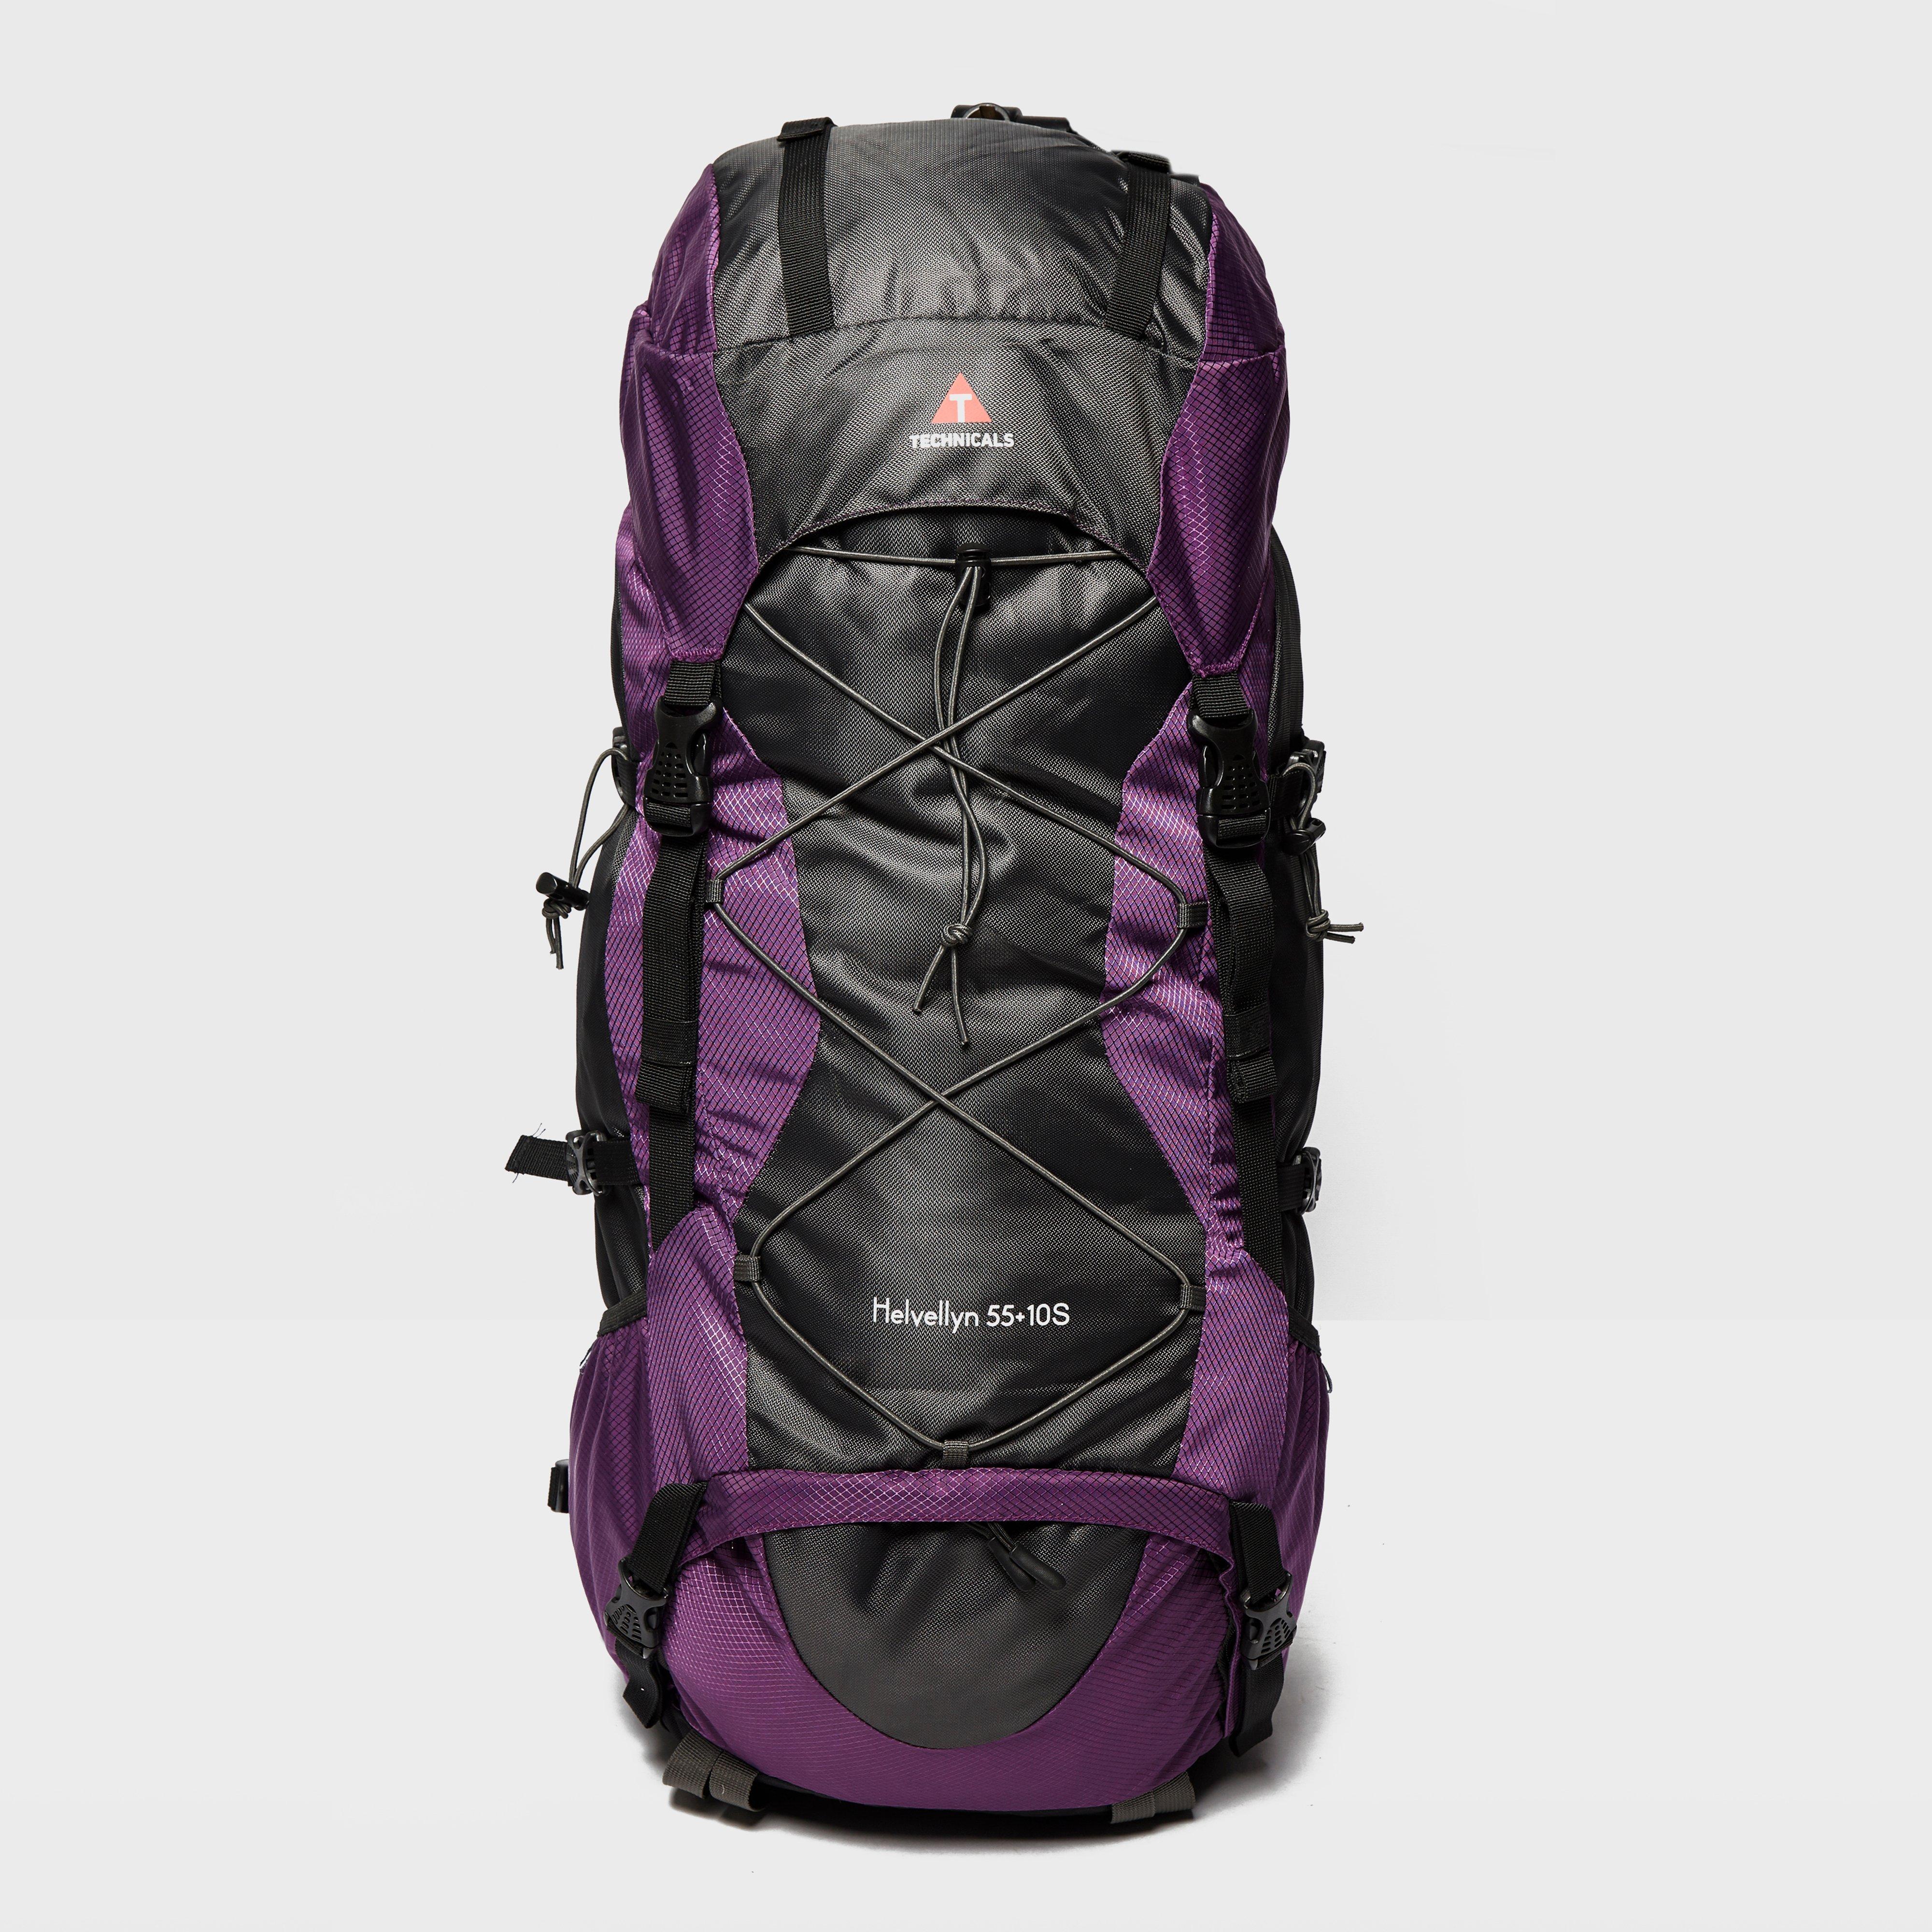 Technicals Helvellyn 5510L Short Rucksack  Purple Purple